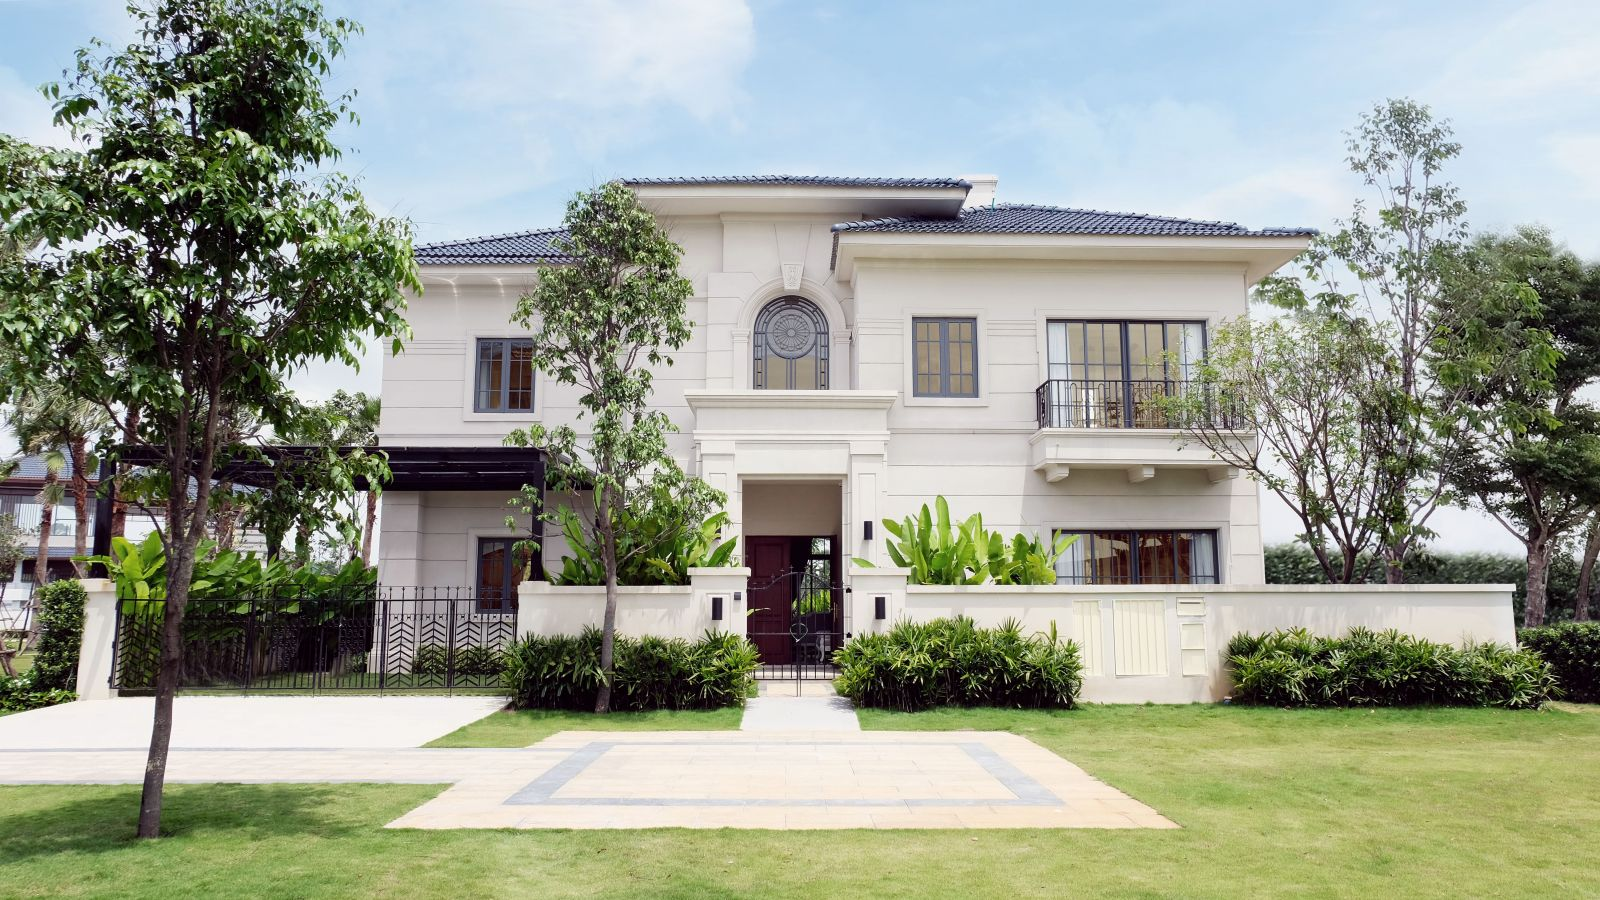 Dinh thự Swanbay La maison